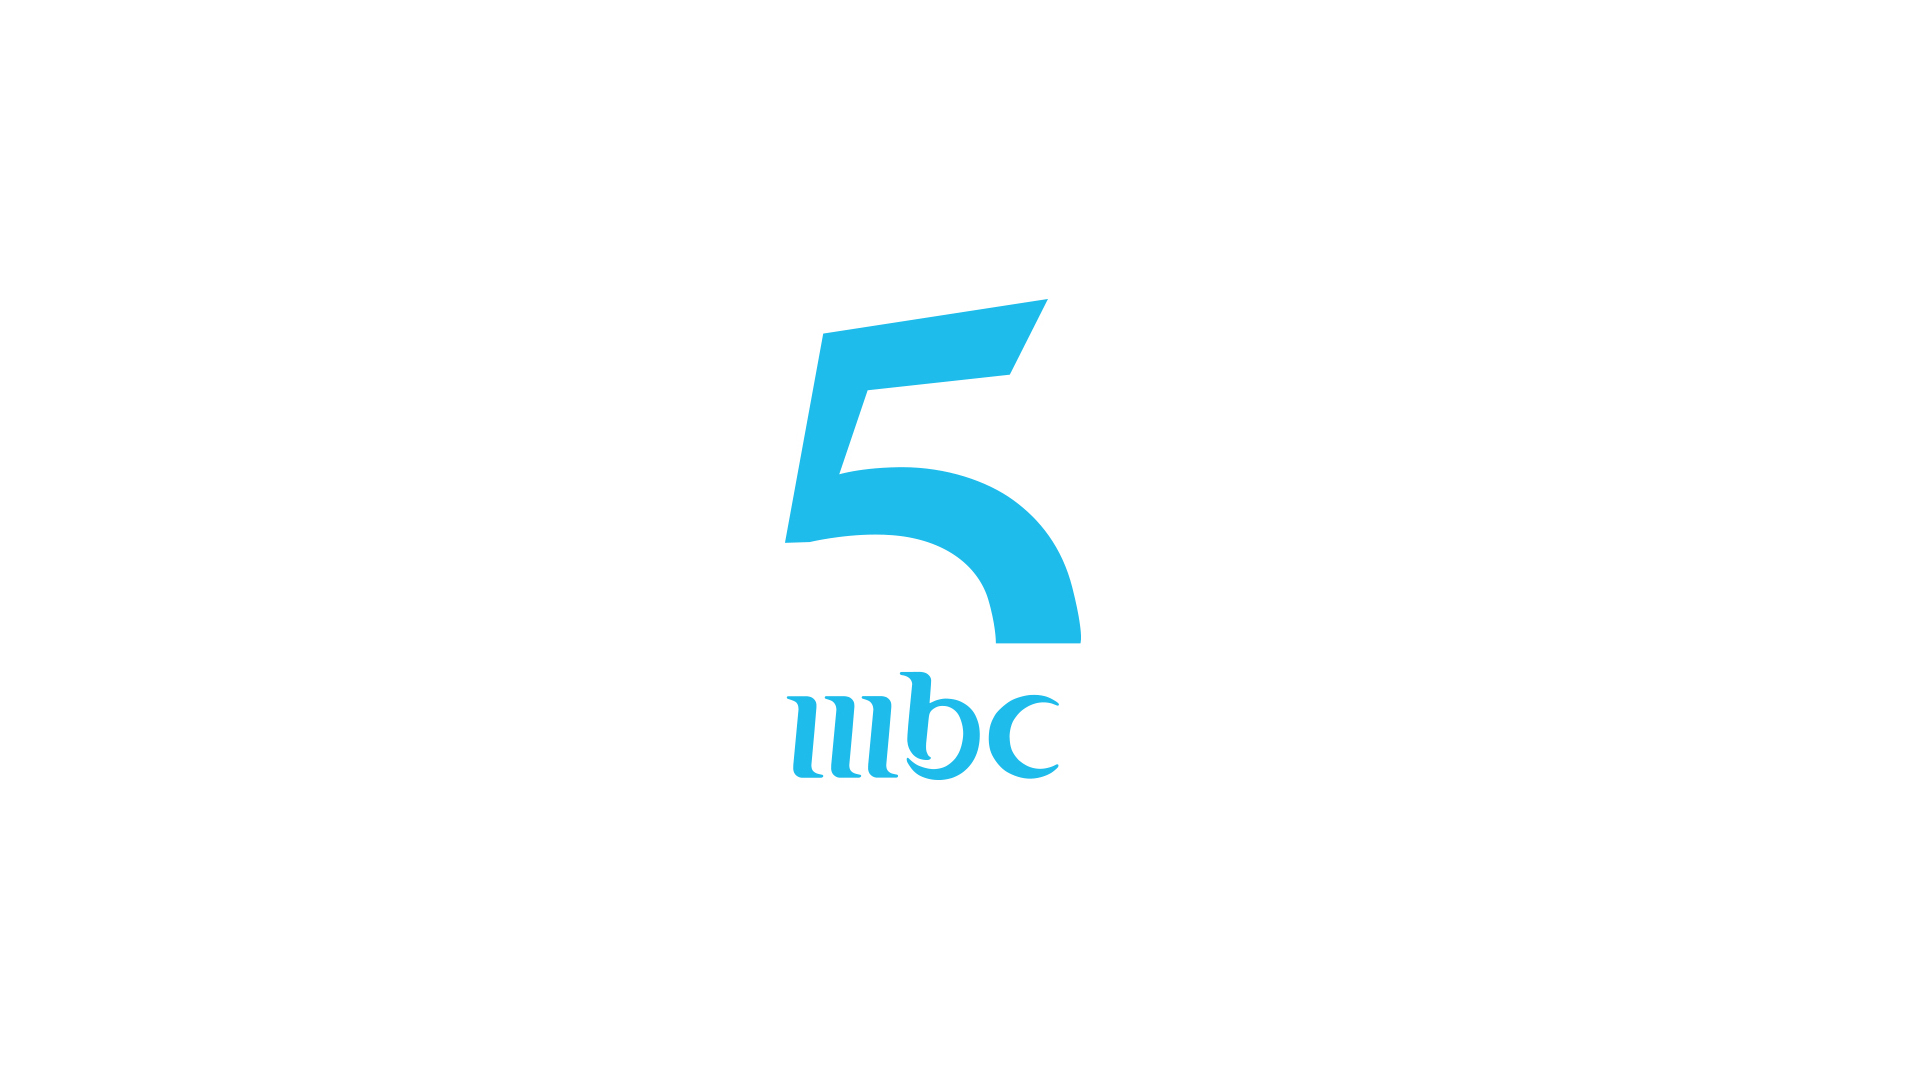 تردد قناة mbc 5 ام بي سي 5 على نايل سات